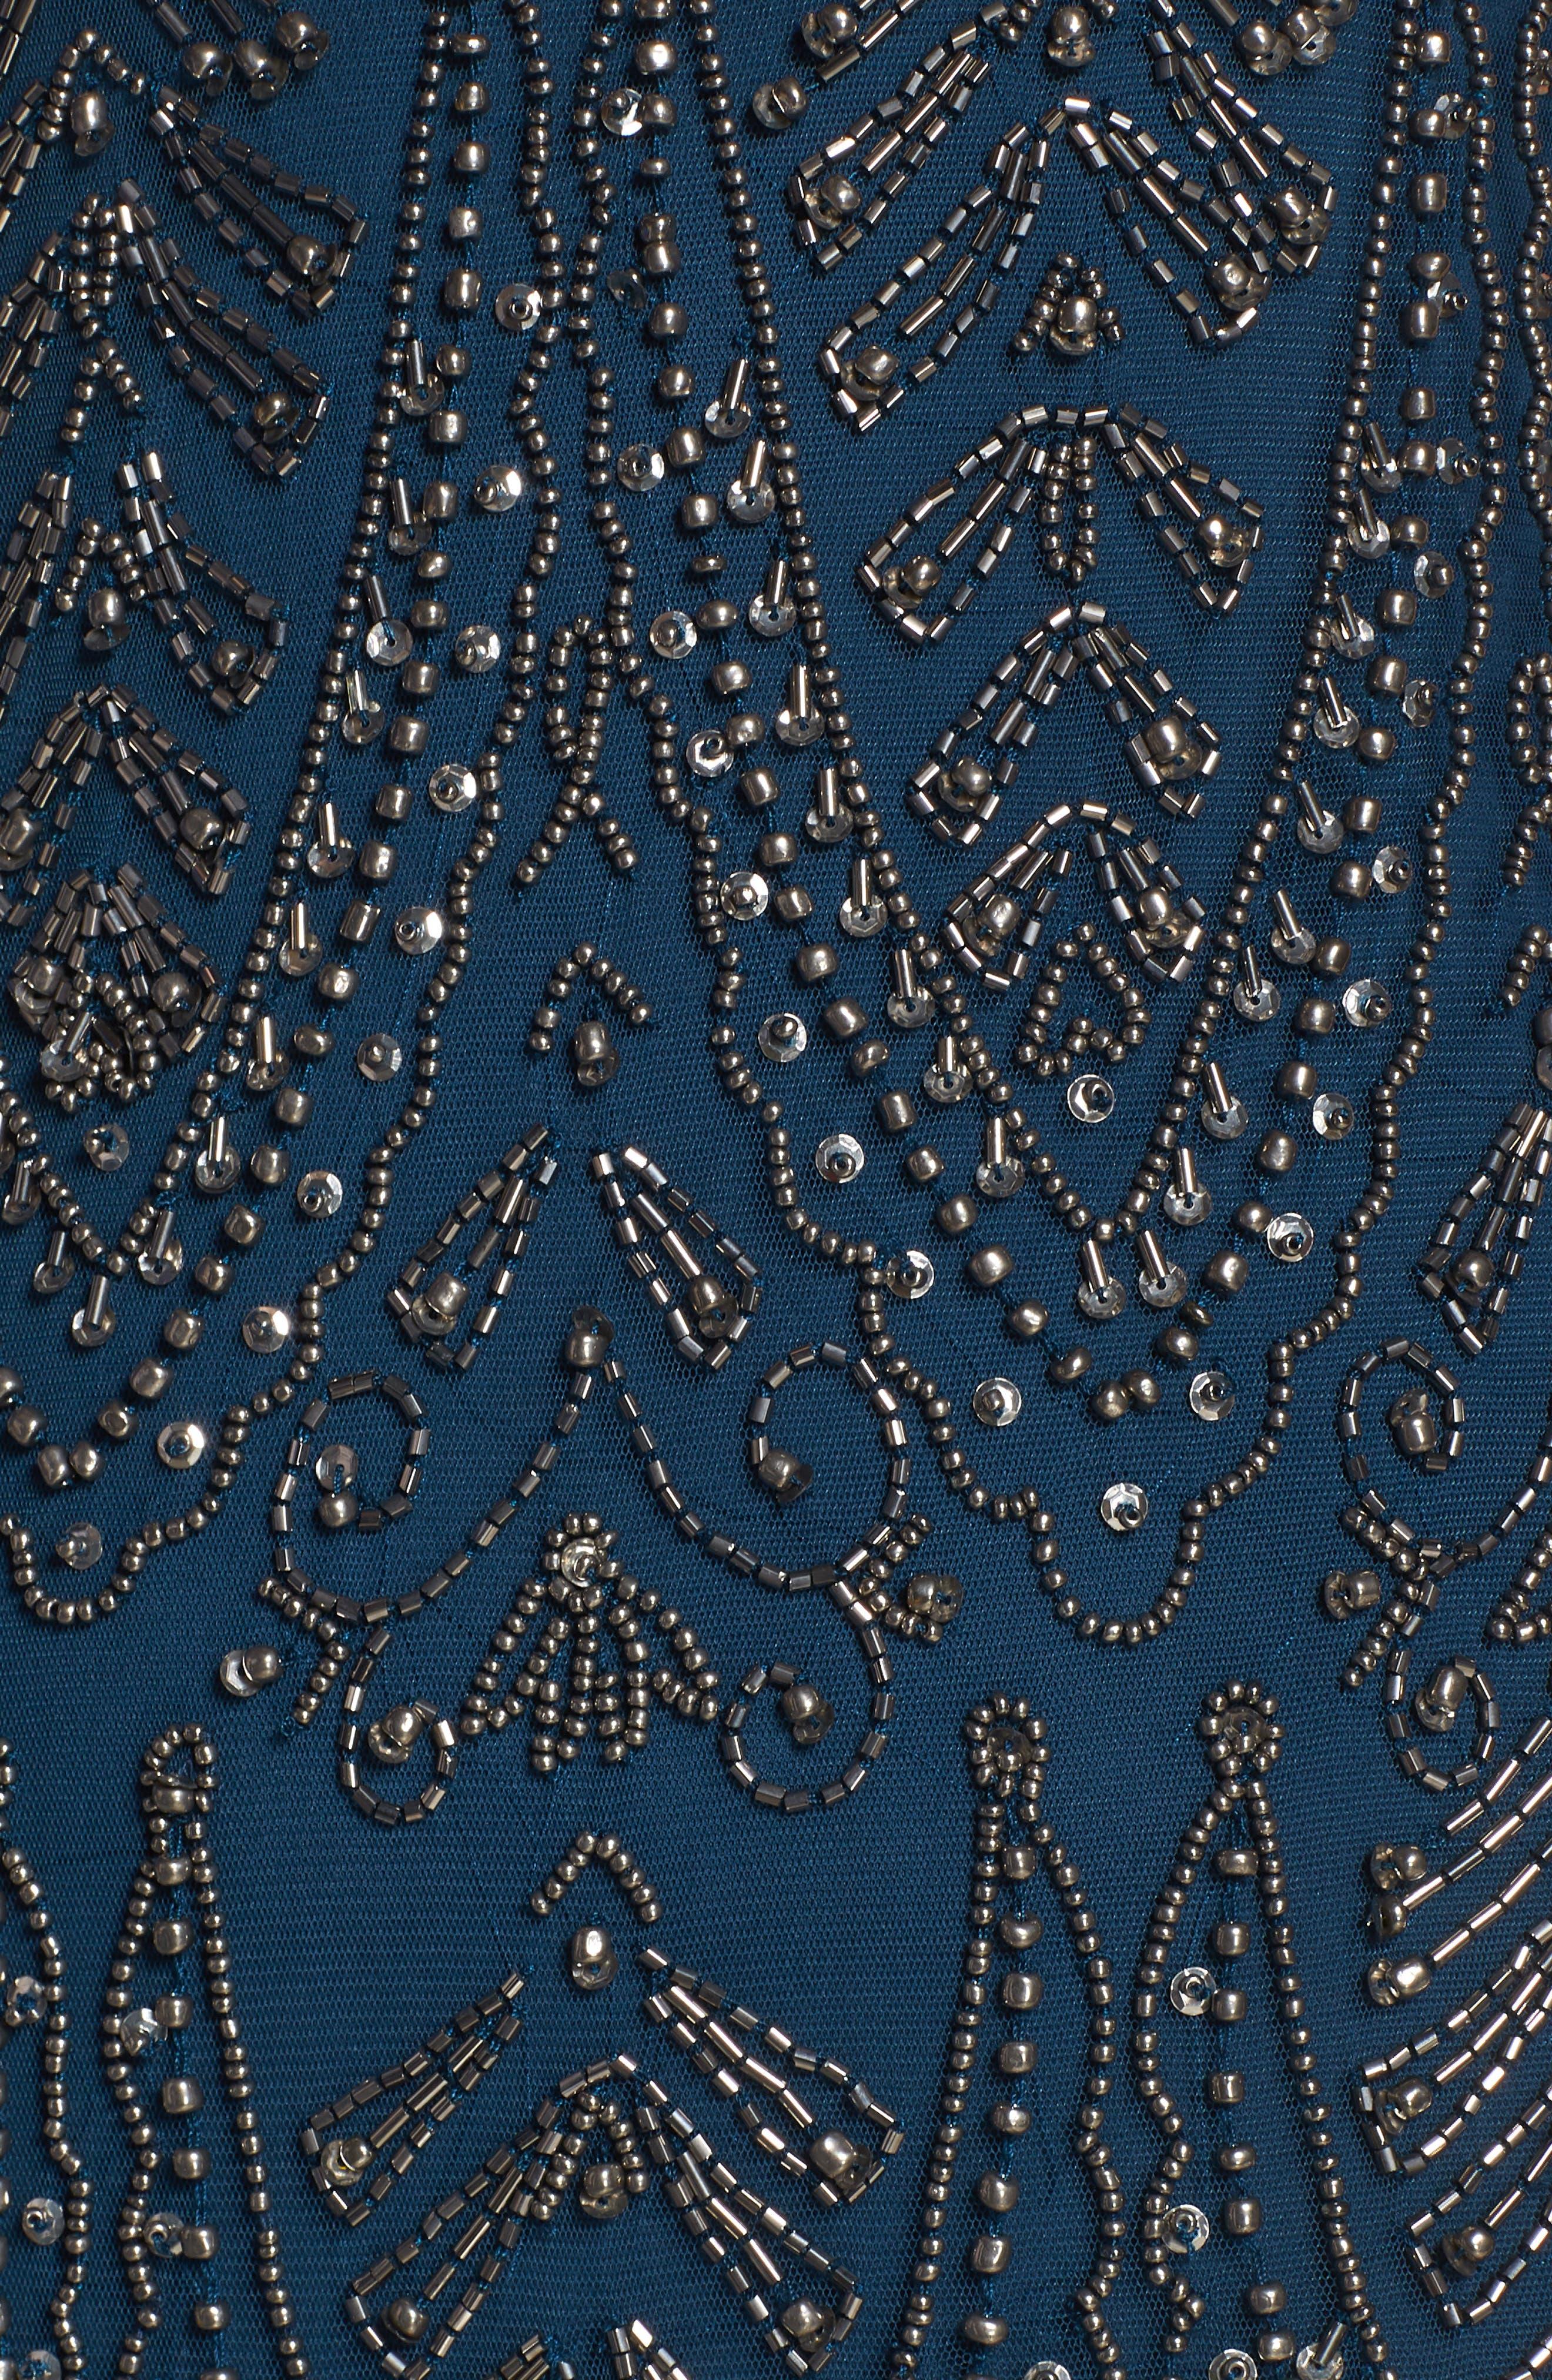 Middy Zigzag Sheath Dress,                             Alternate thumbnail 6, color,                             PEACOCK